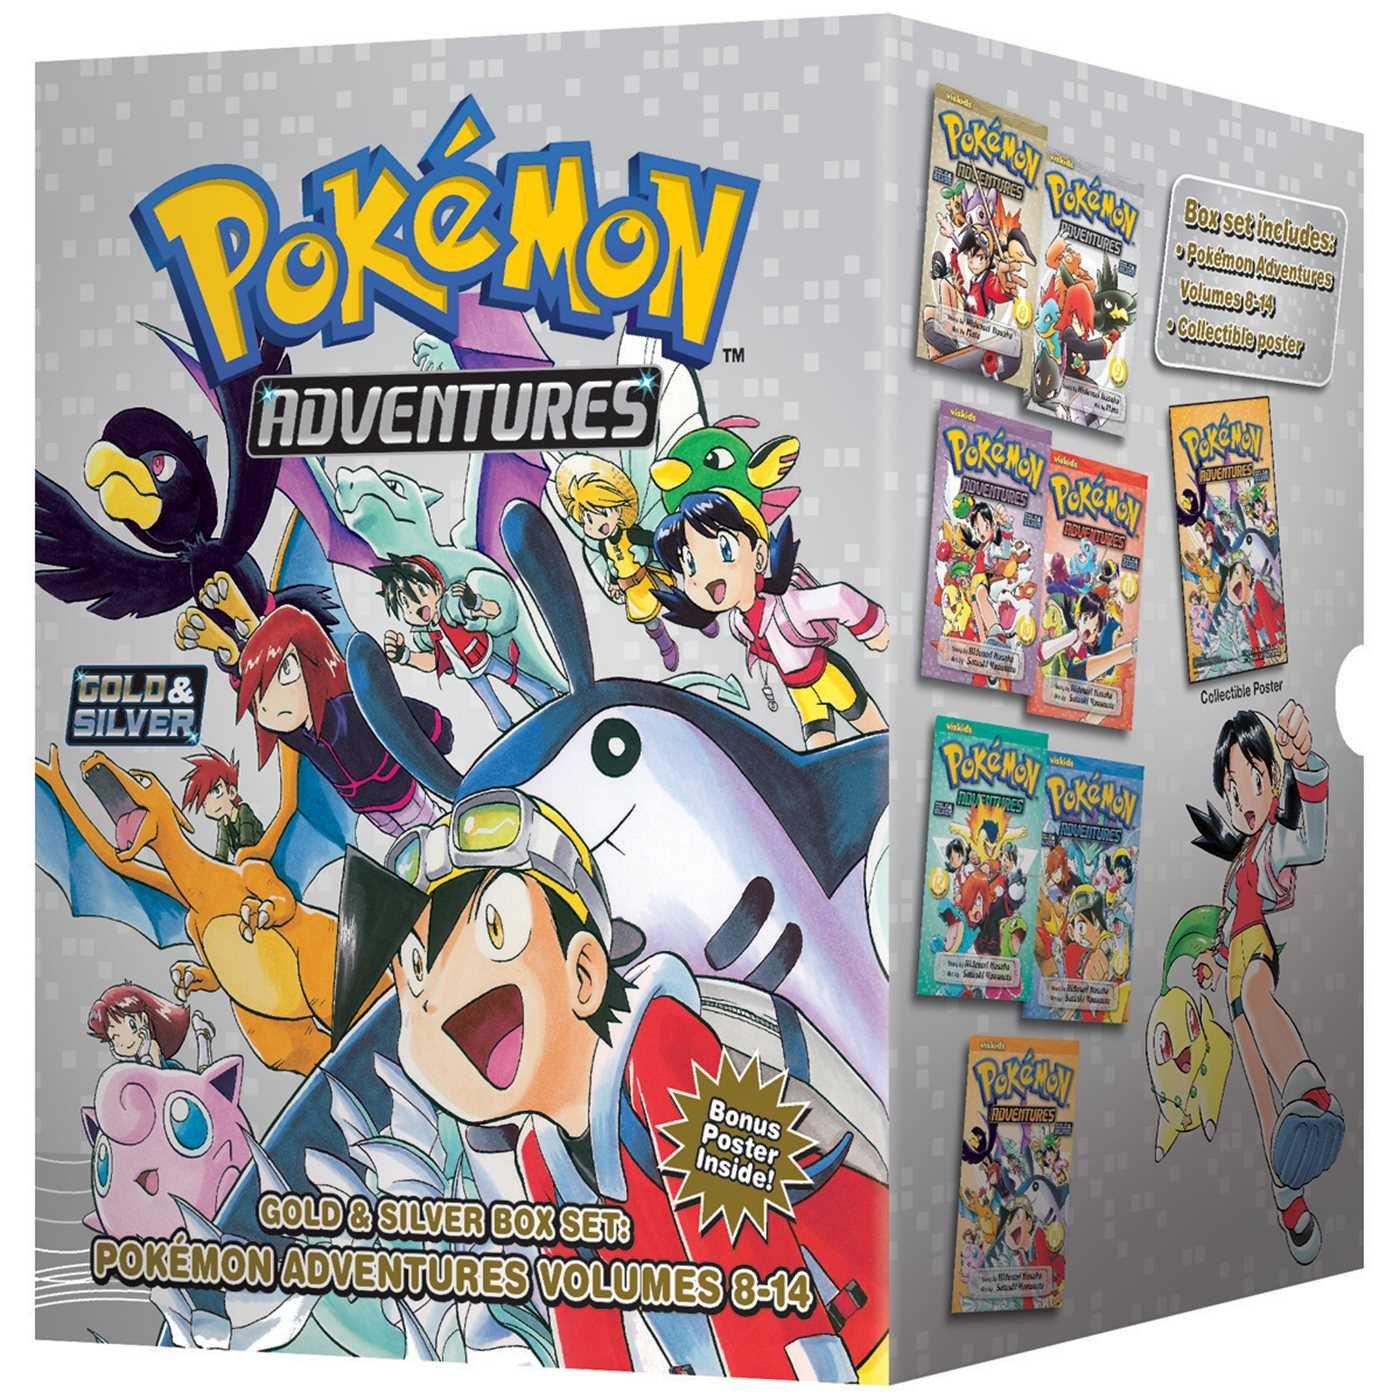 Pokémon Adventures Gold & Silver Box Set (set includes Vol. 8-14) (Pokemon) by VIZ Media - Children's